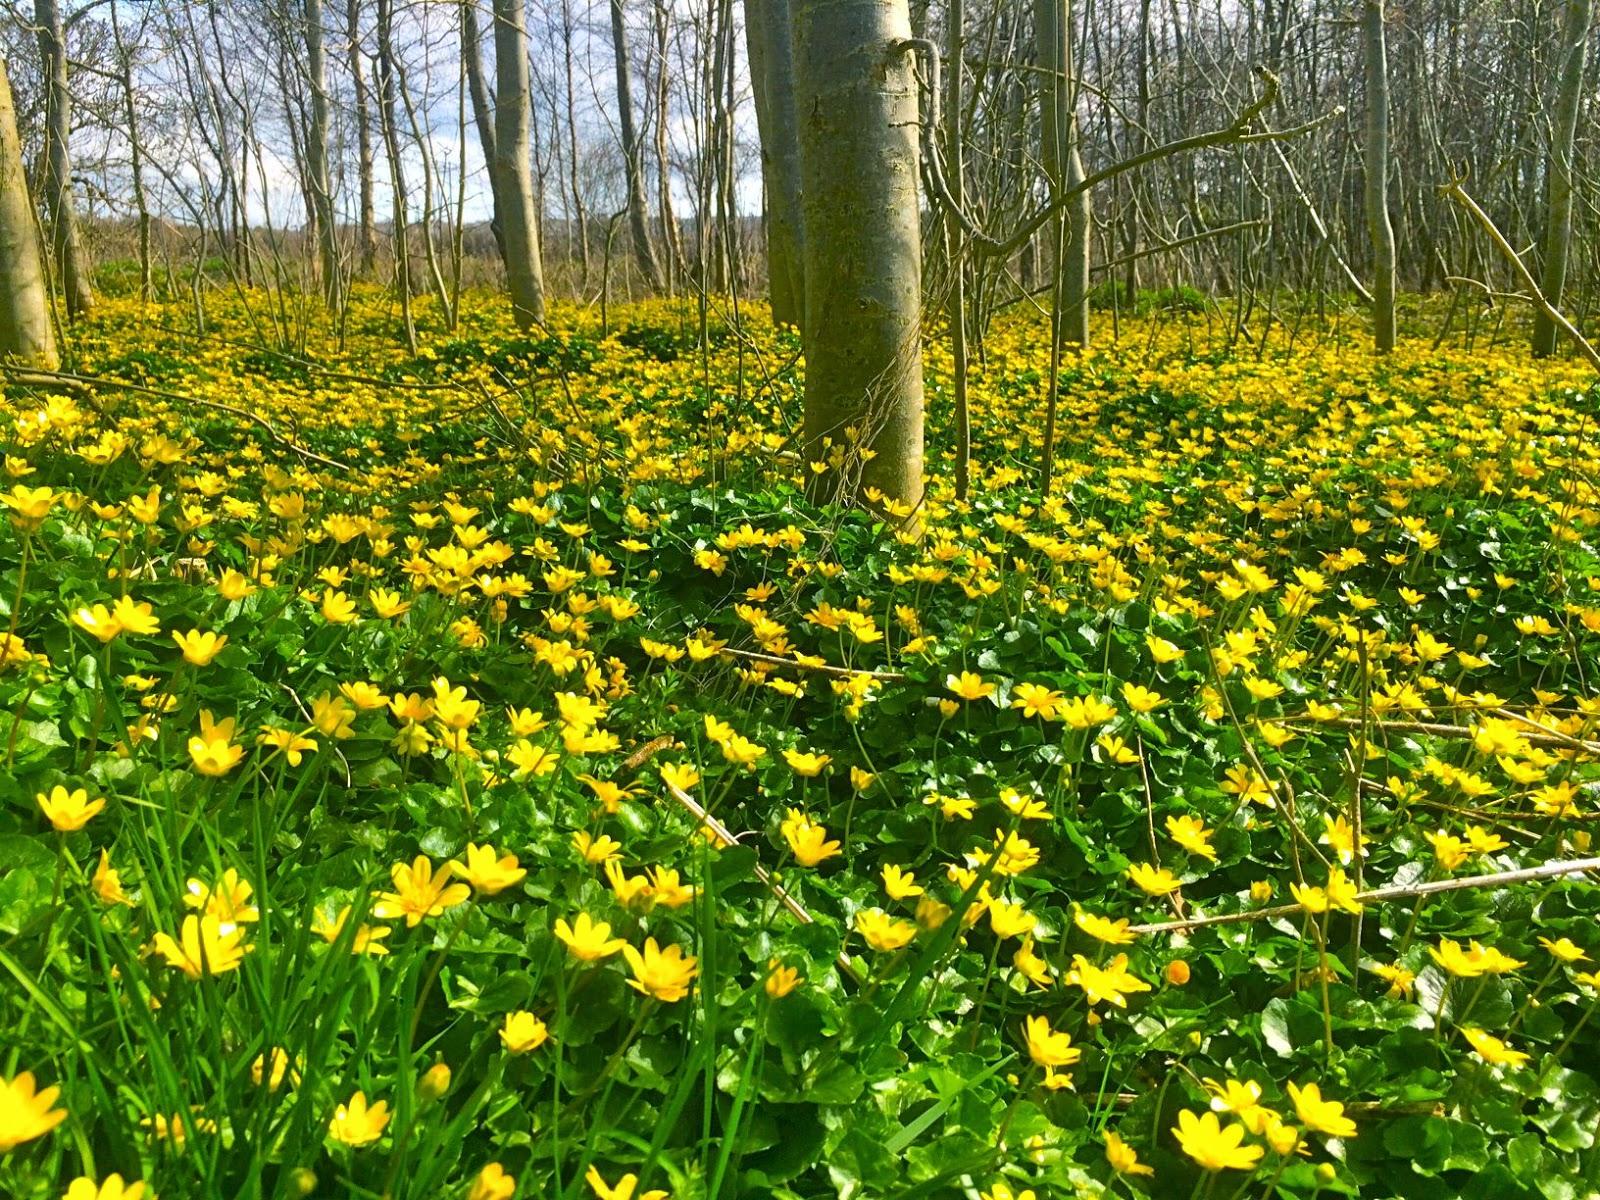 Terryland Forest Park Flowers